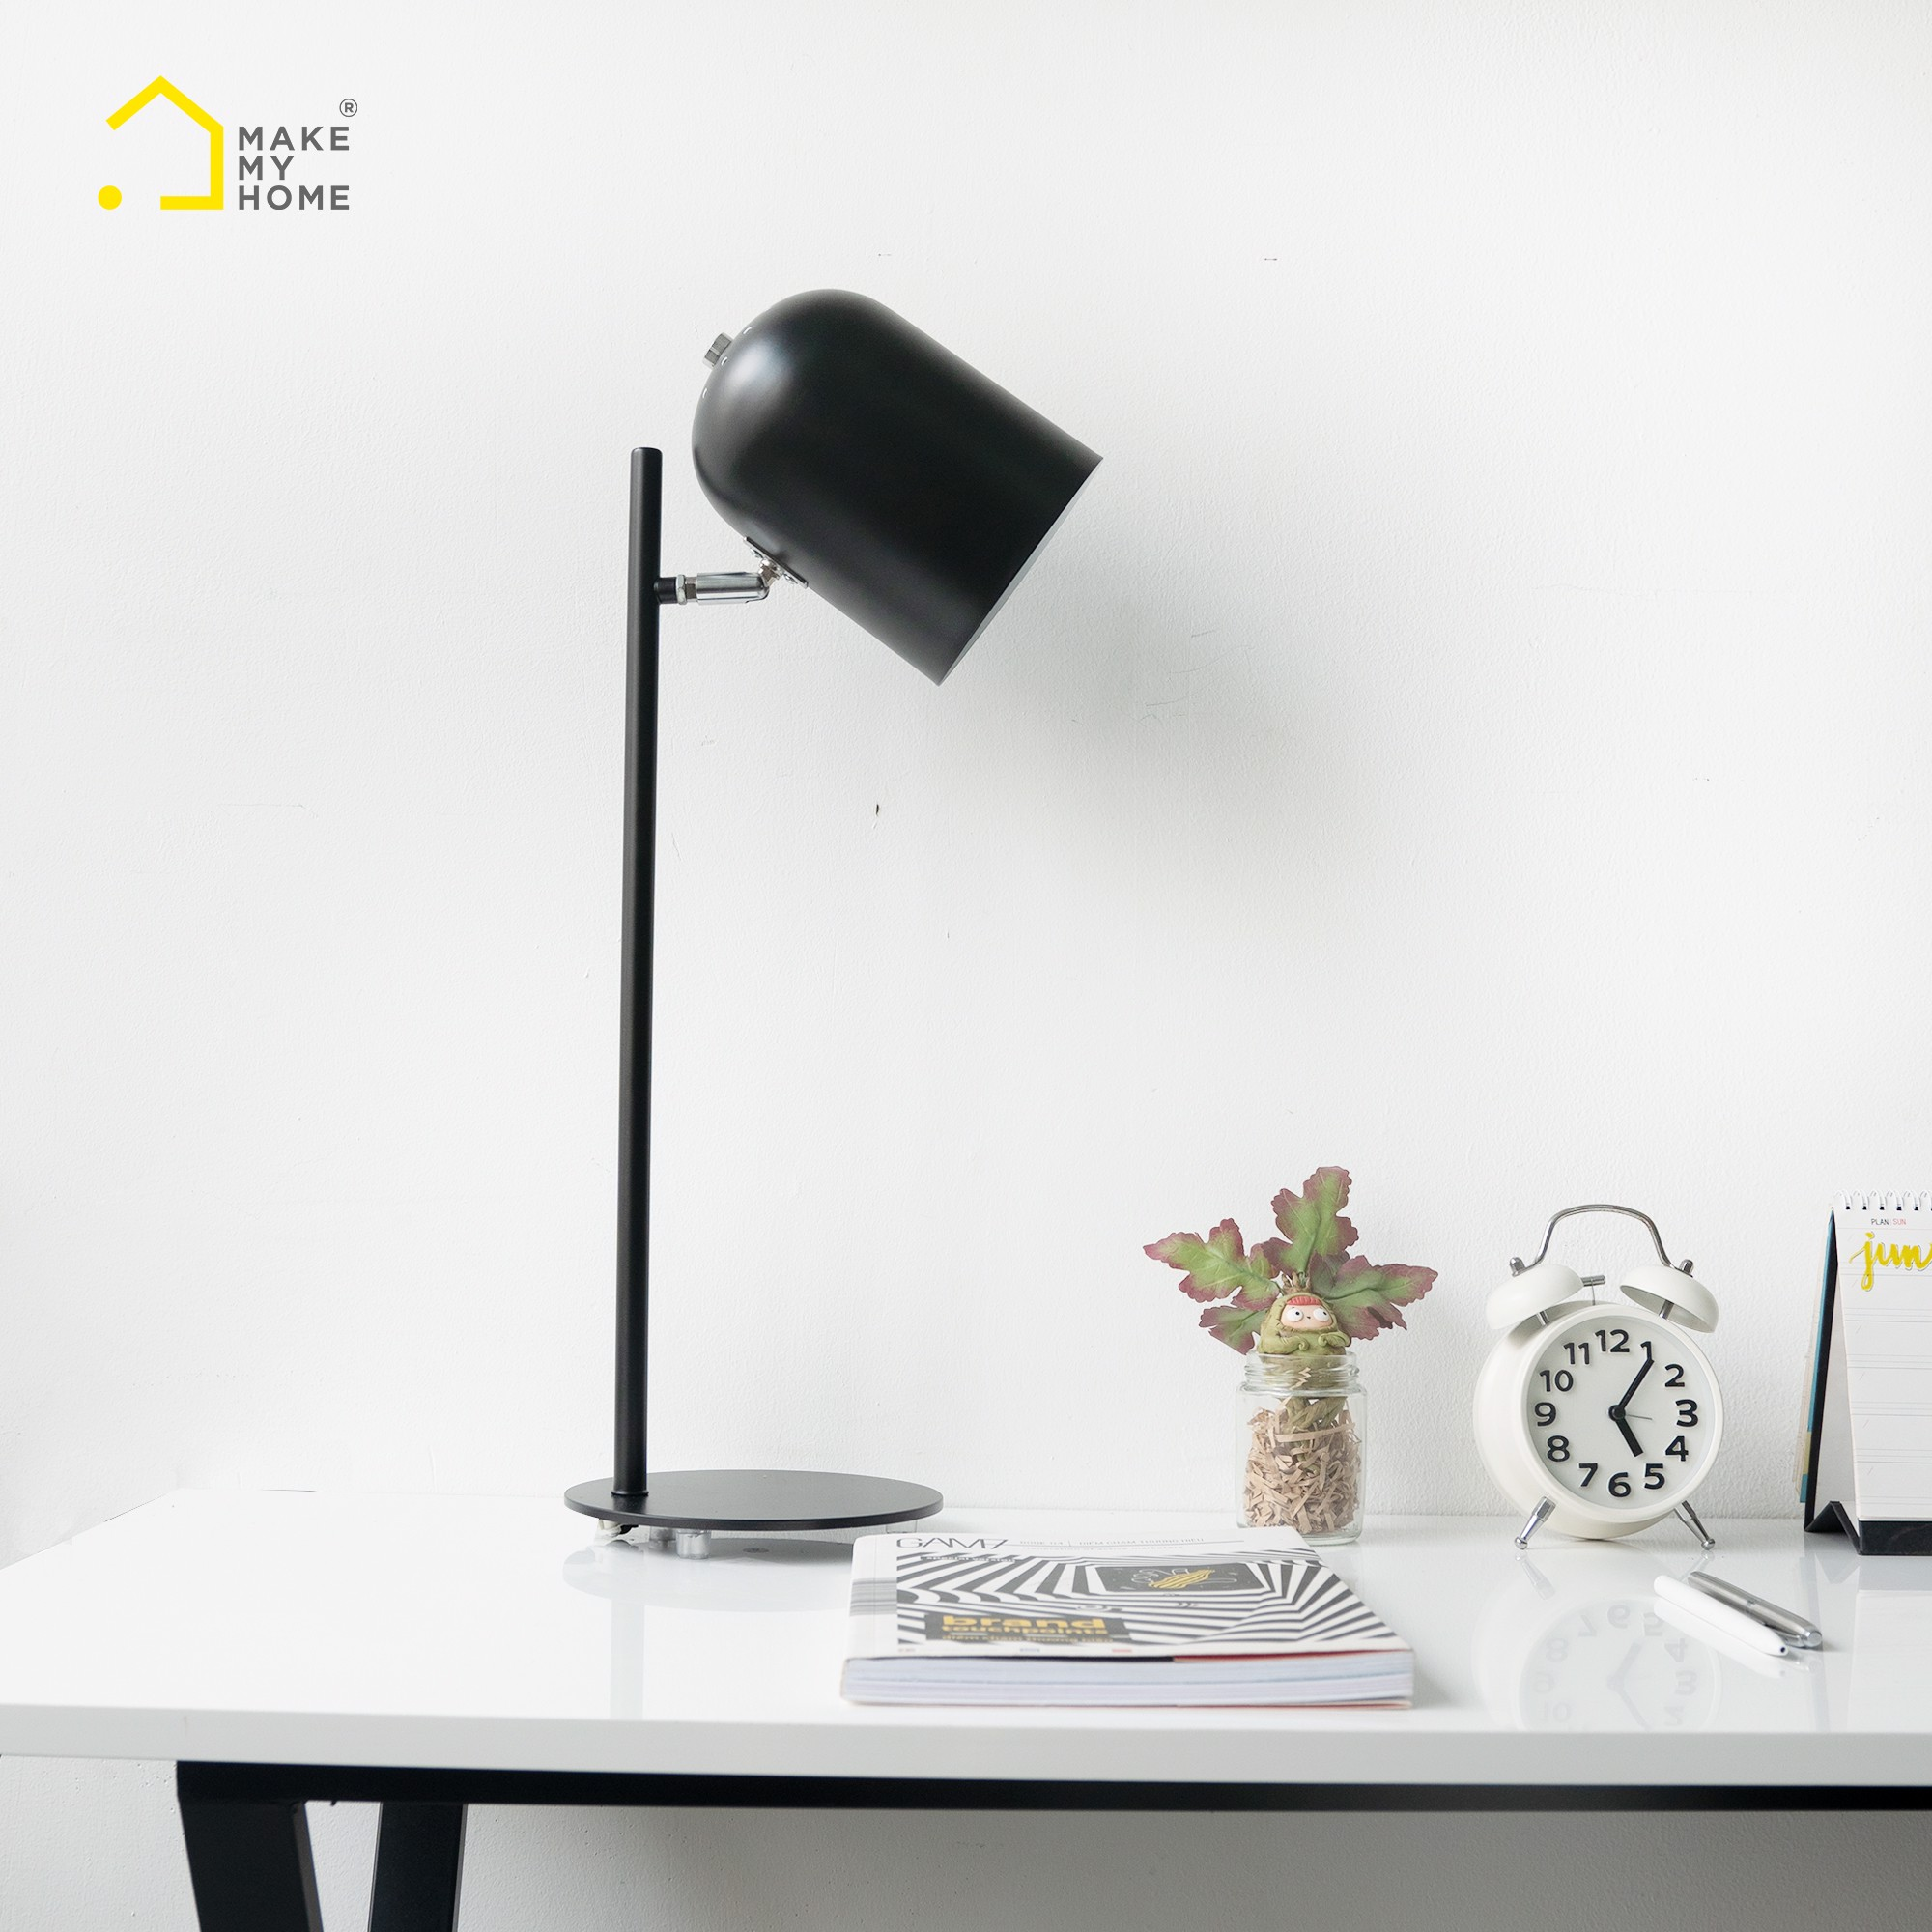 Đèn Học Để Bàn Make My Home TATA